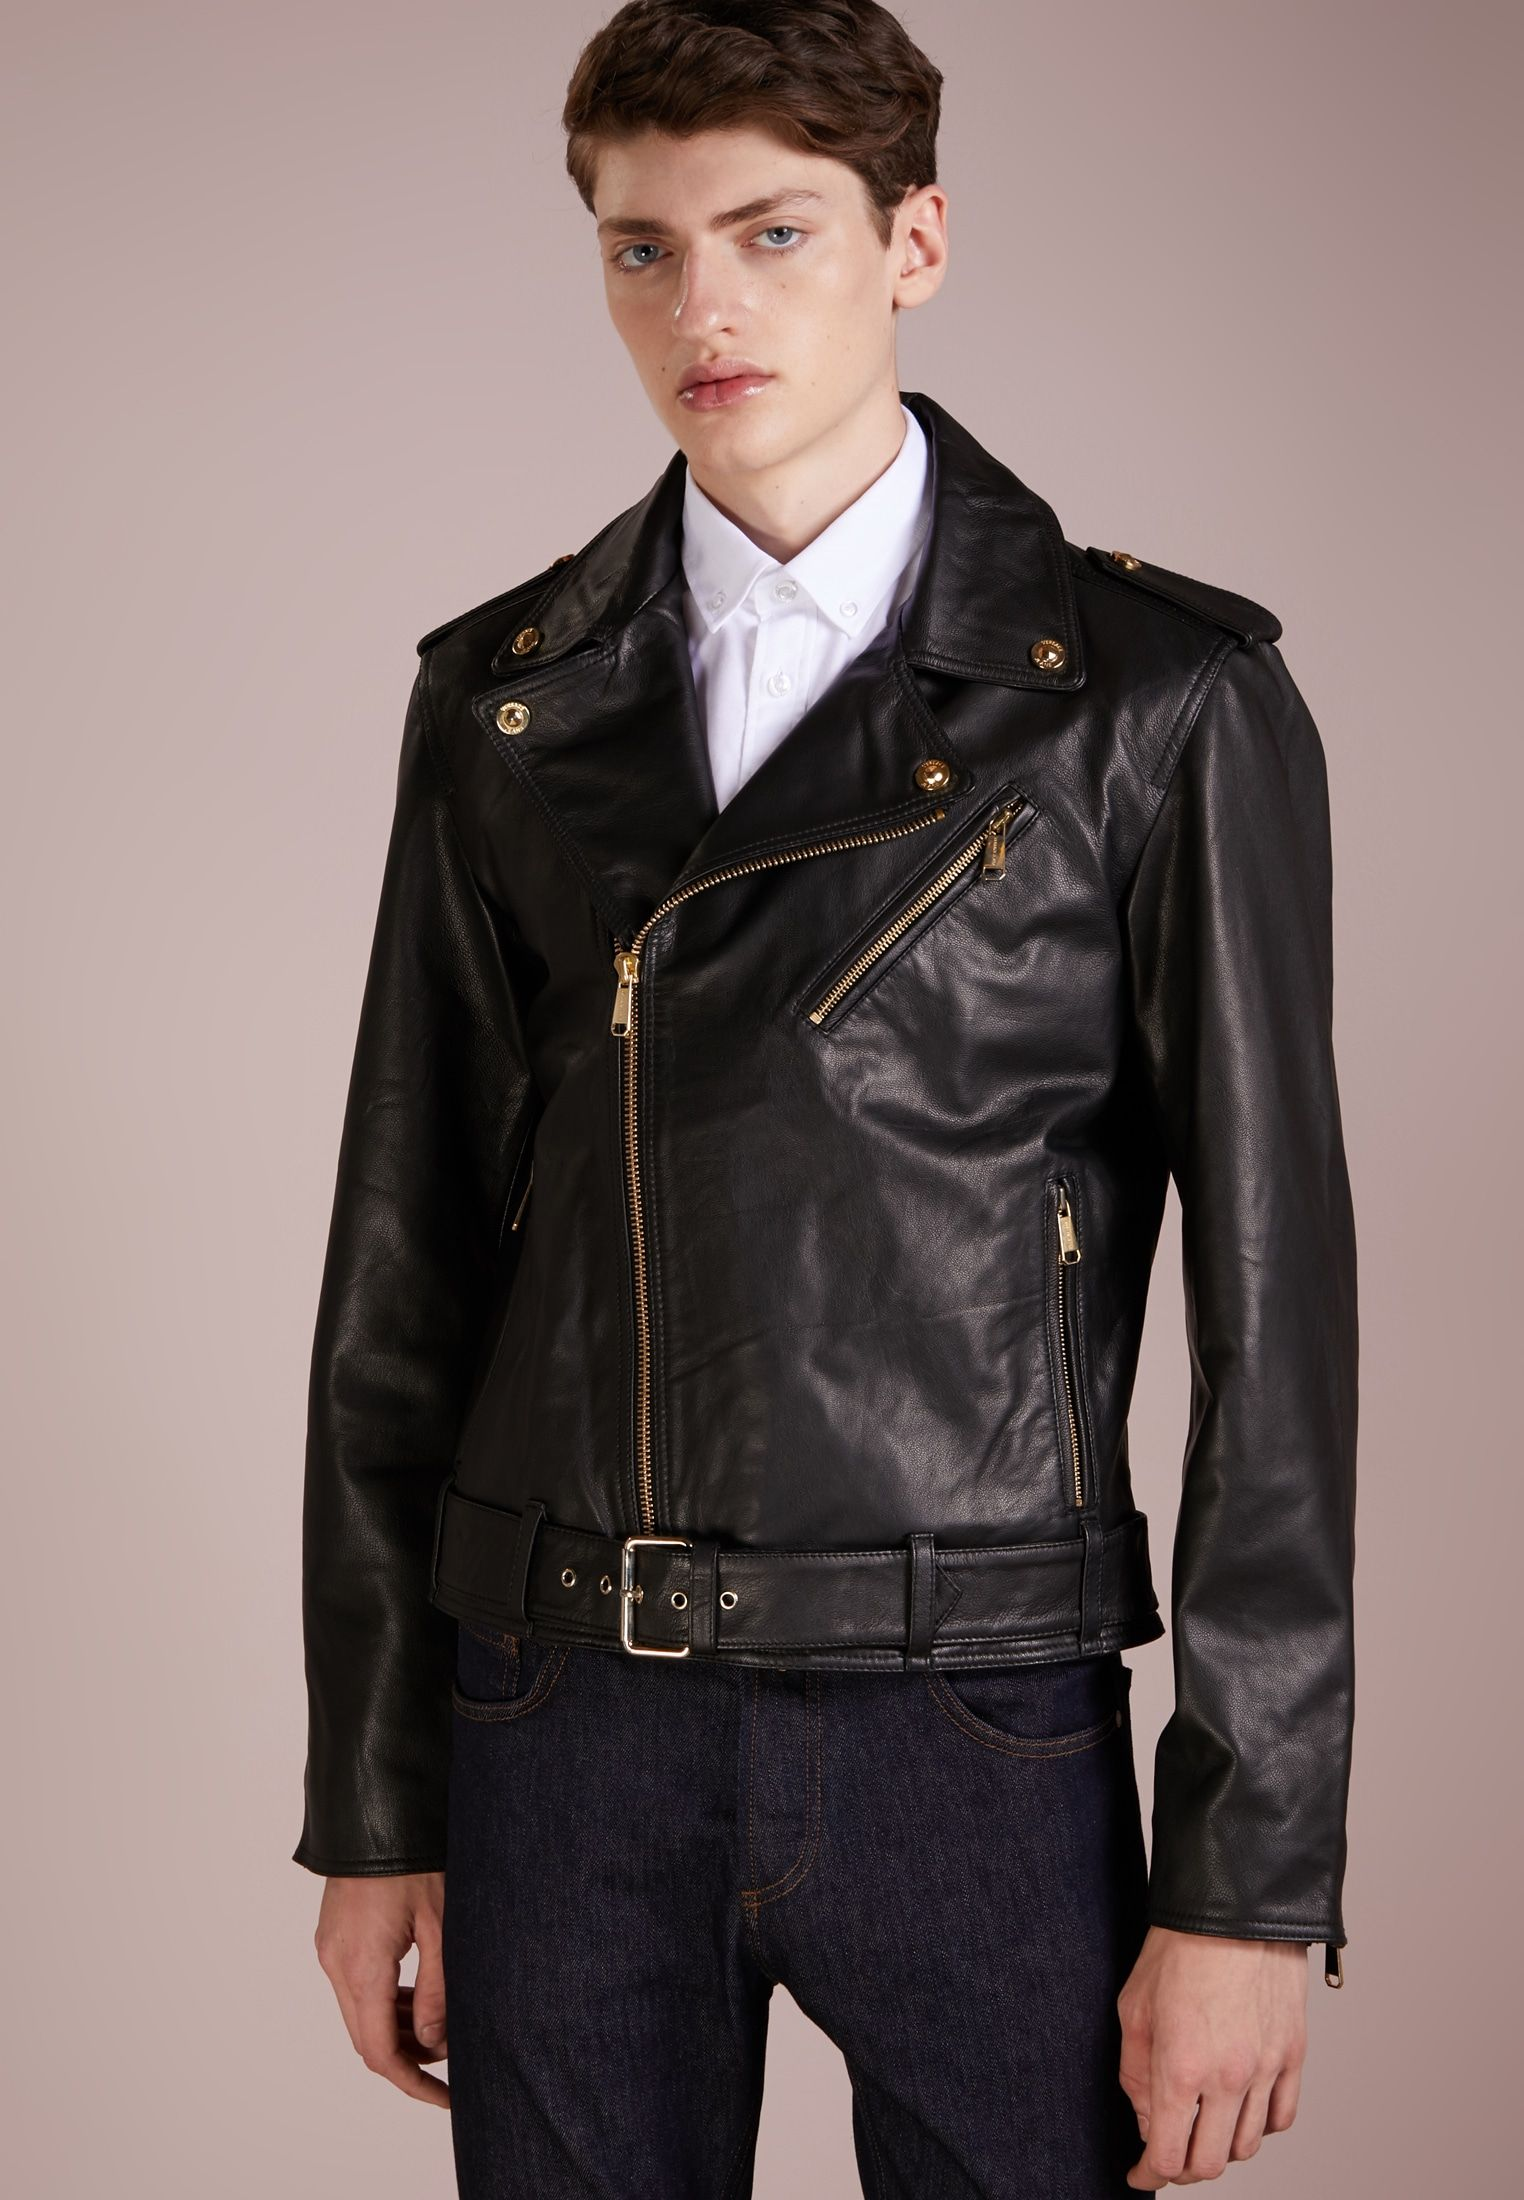 3ab61dcb5b18 Veste en cuir - nero   Pieces of clothing   Pinterest   Versace ...